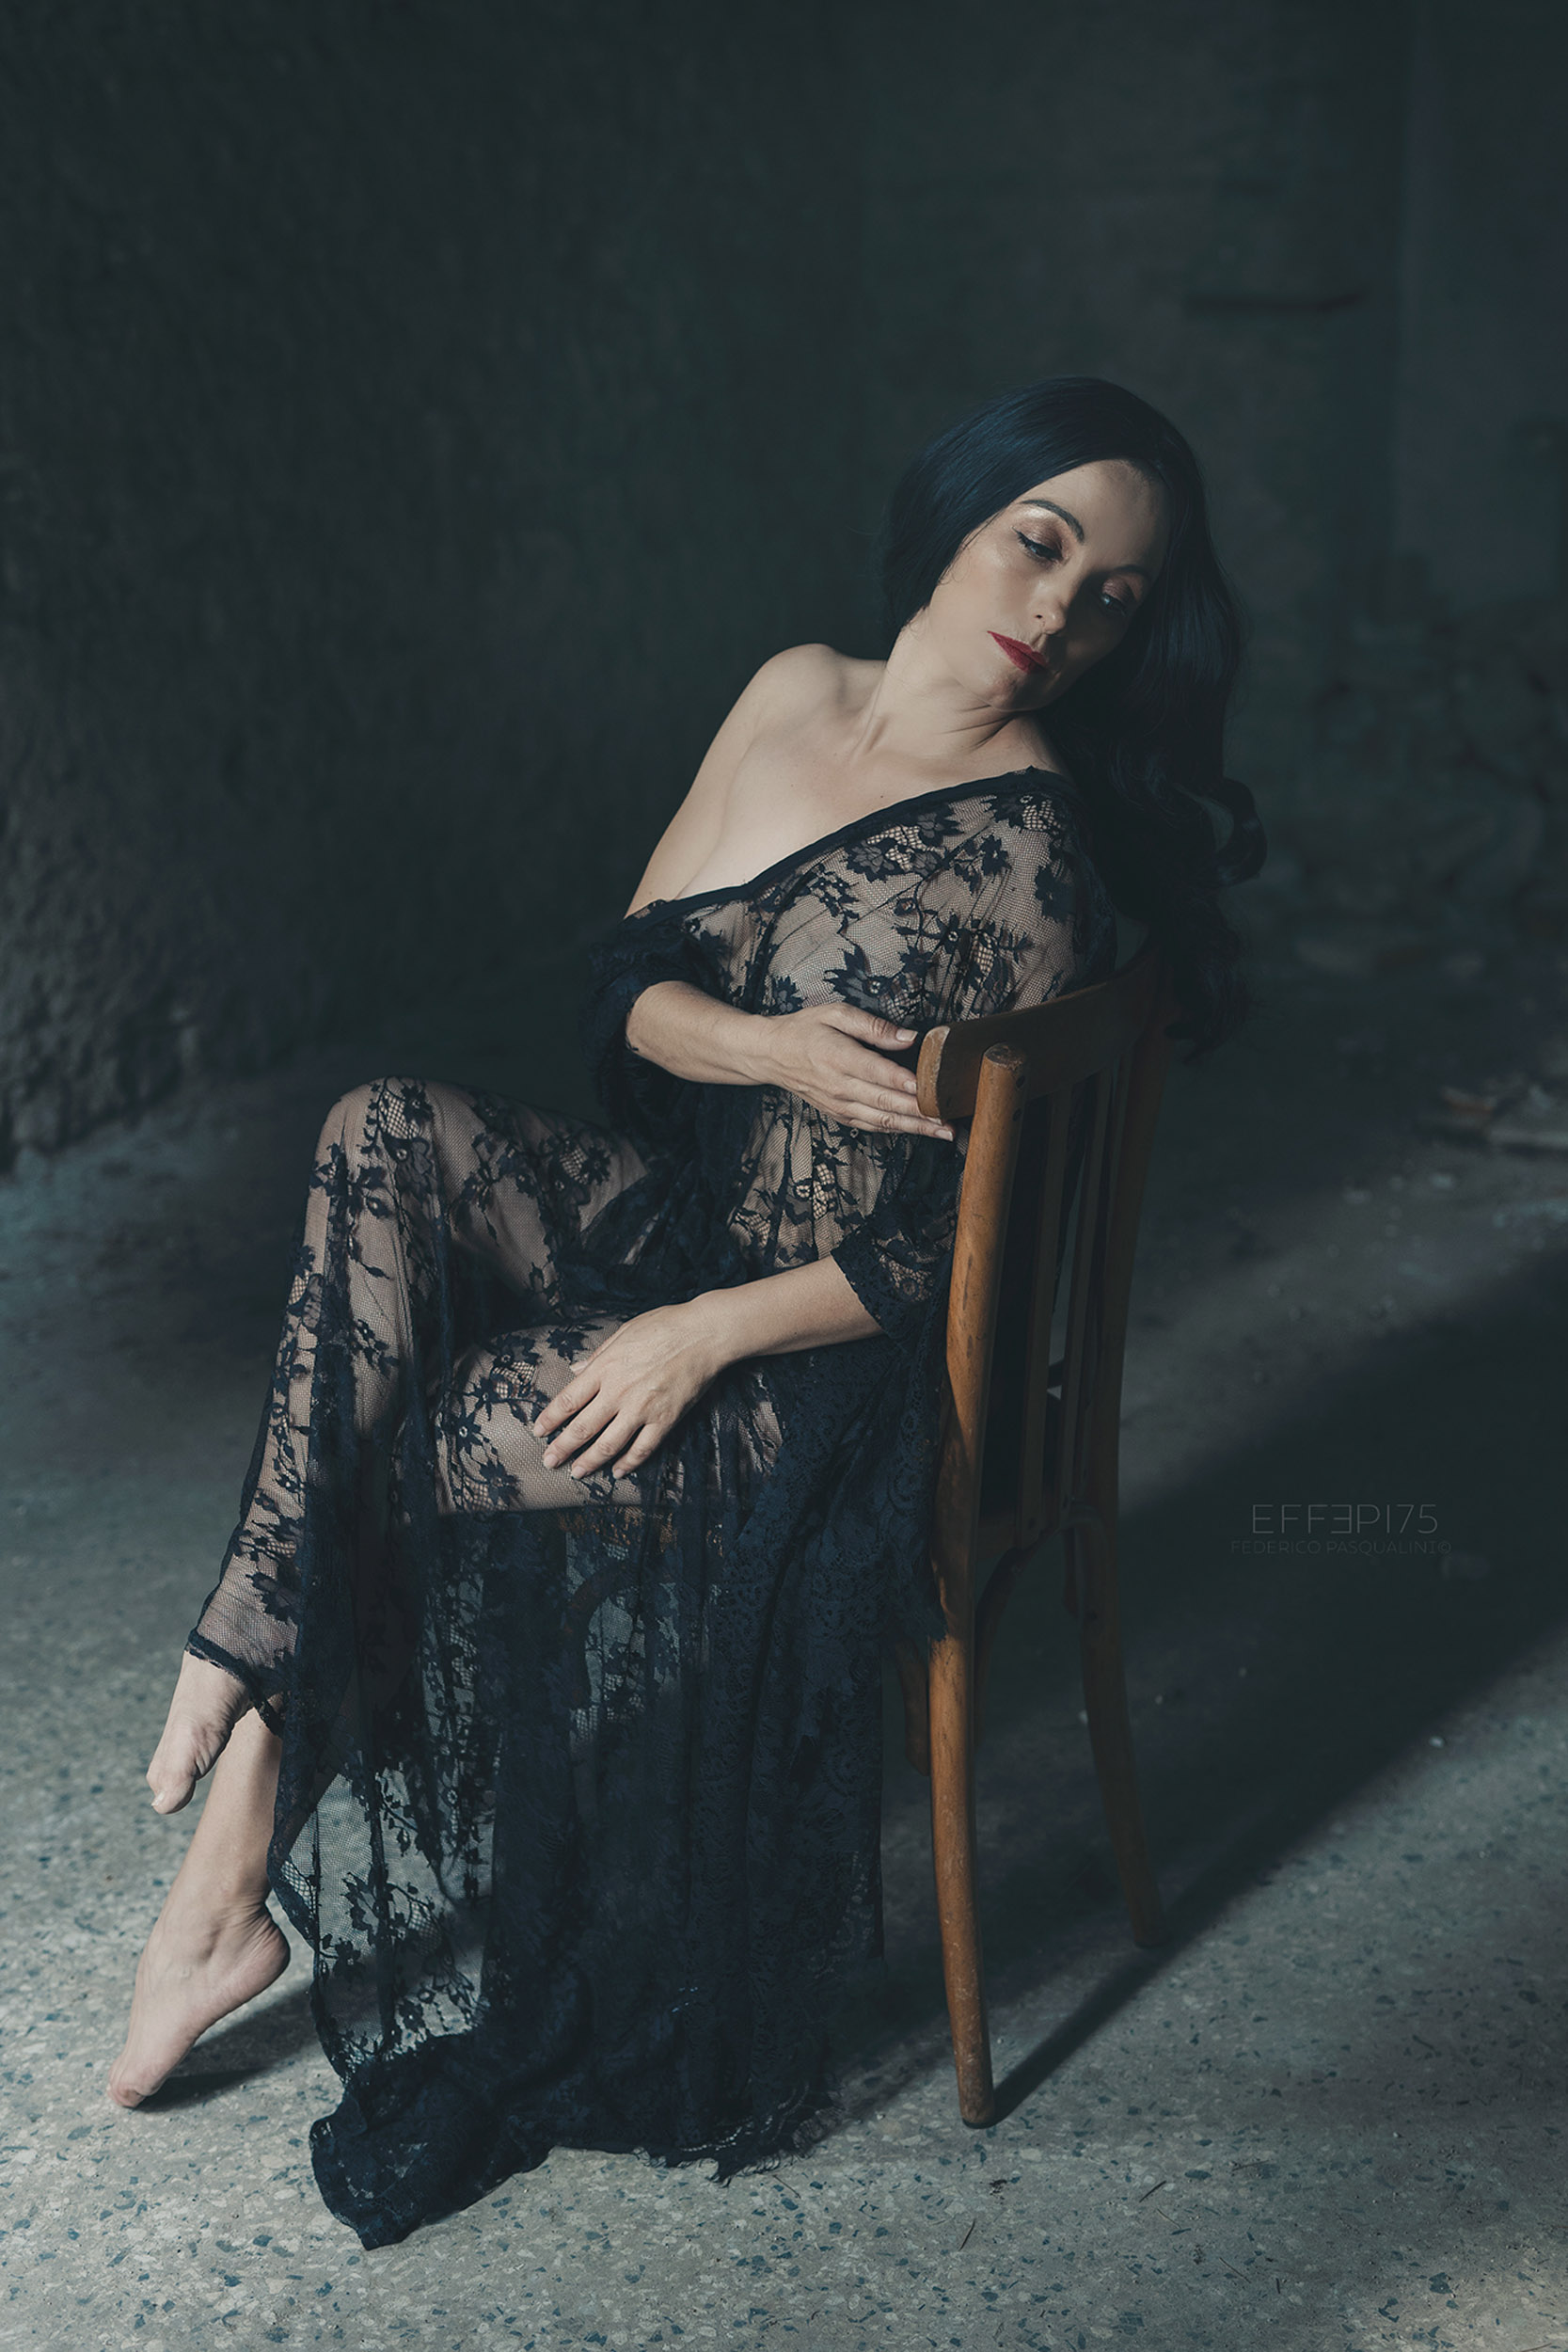 Categorie: Glamour, Portrait, Boudoir & Nude - Photographer: FEDERICO PASQUALINI - Model: ORIANA DAKOTA - Location: Vicenza, VI, Italia